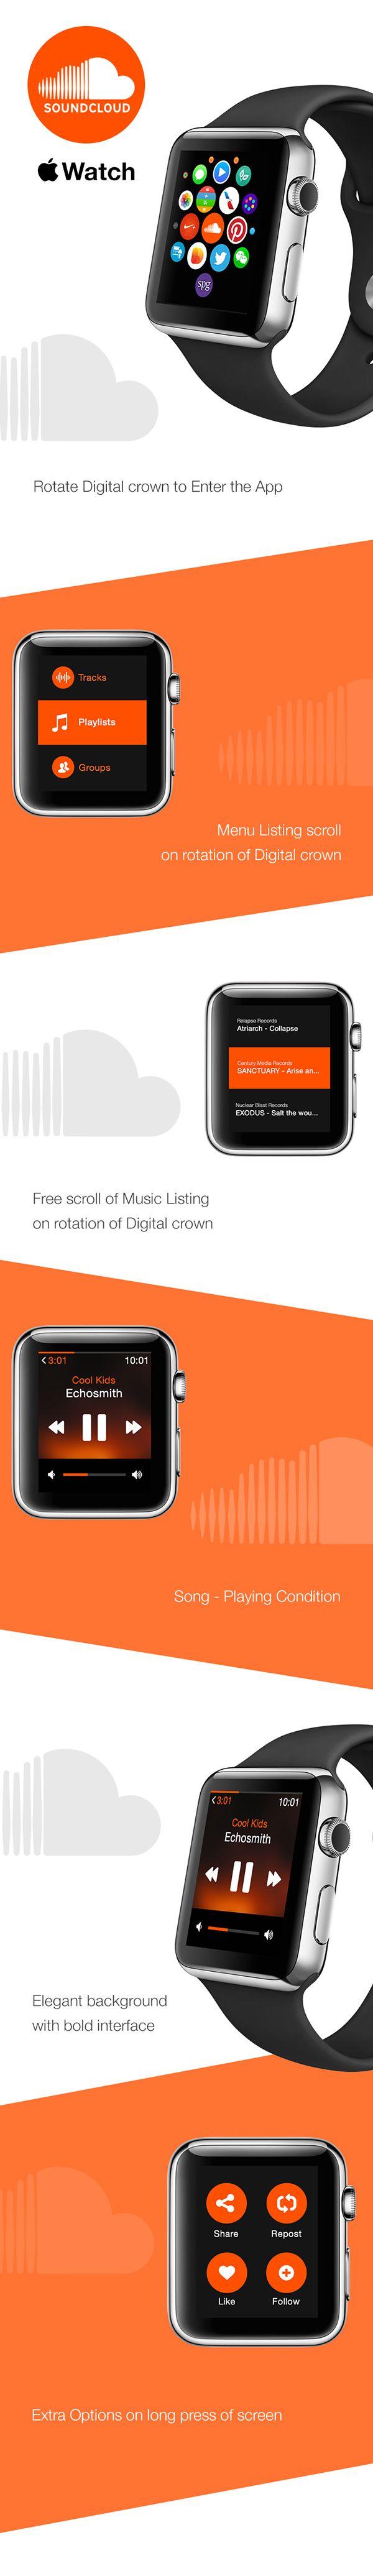 Soundcloud - Apple watch on Behance